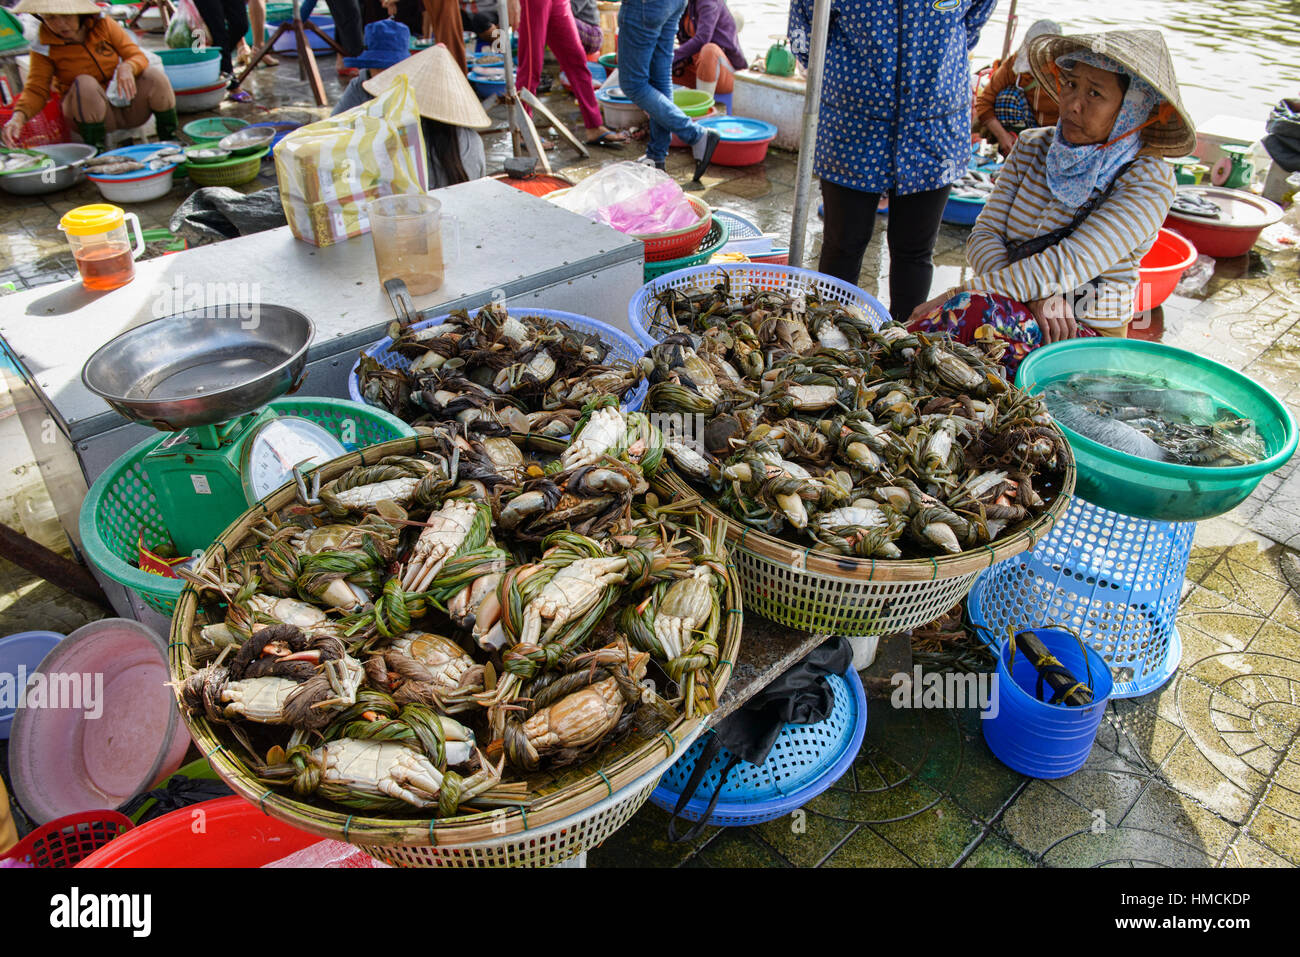 Crab vendor in the fish market, Hoi An, Vietnam Stock Photo